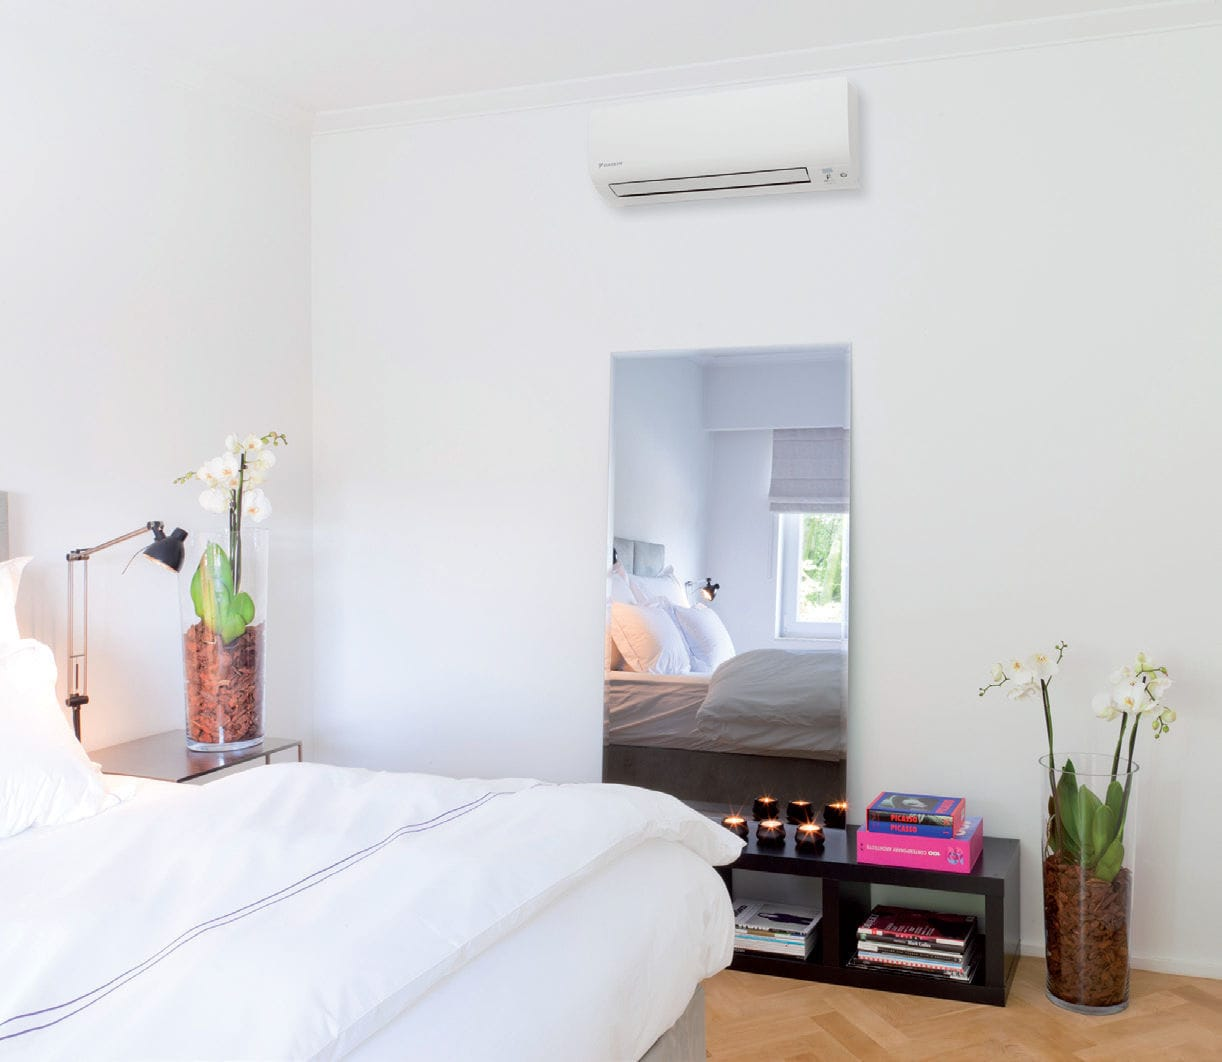 Wallmounted air conditioner ceiling duct multisplit AURORA